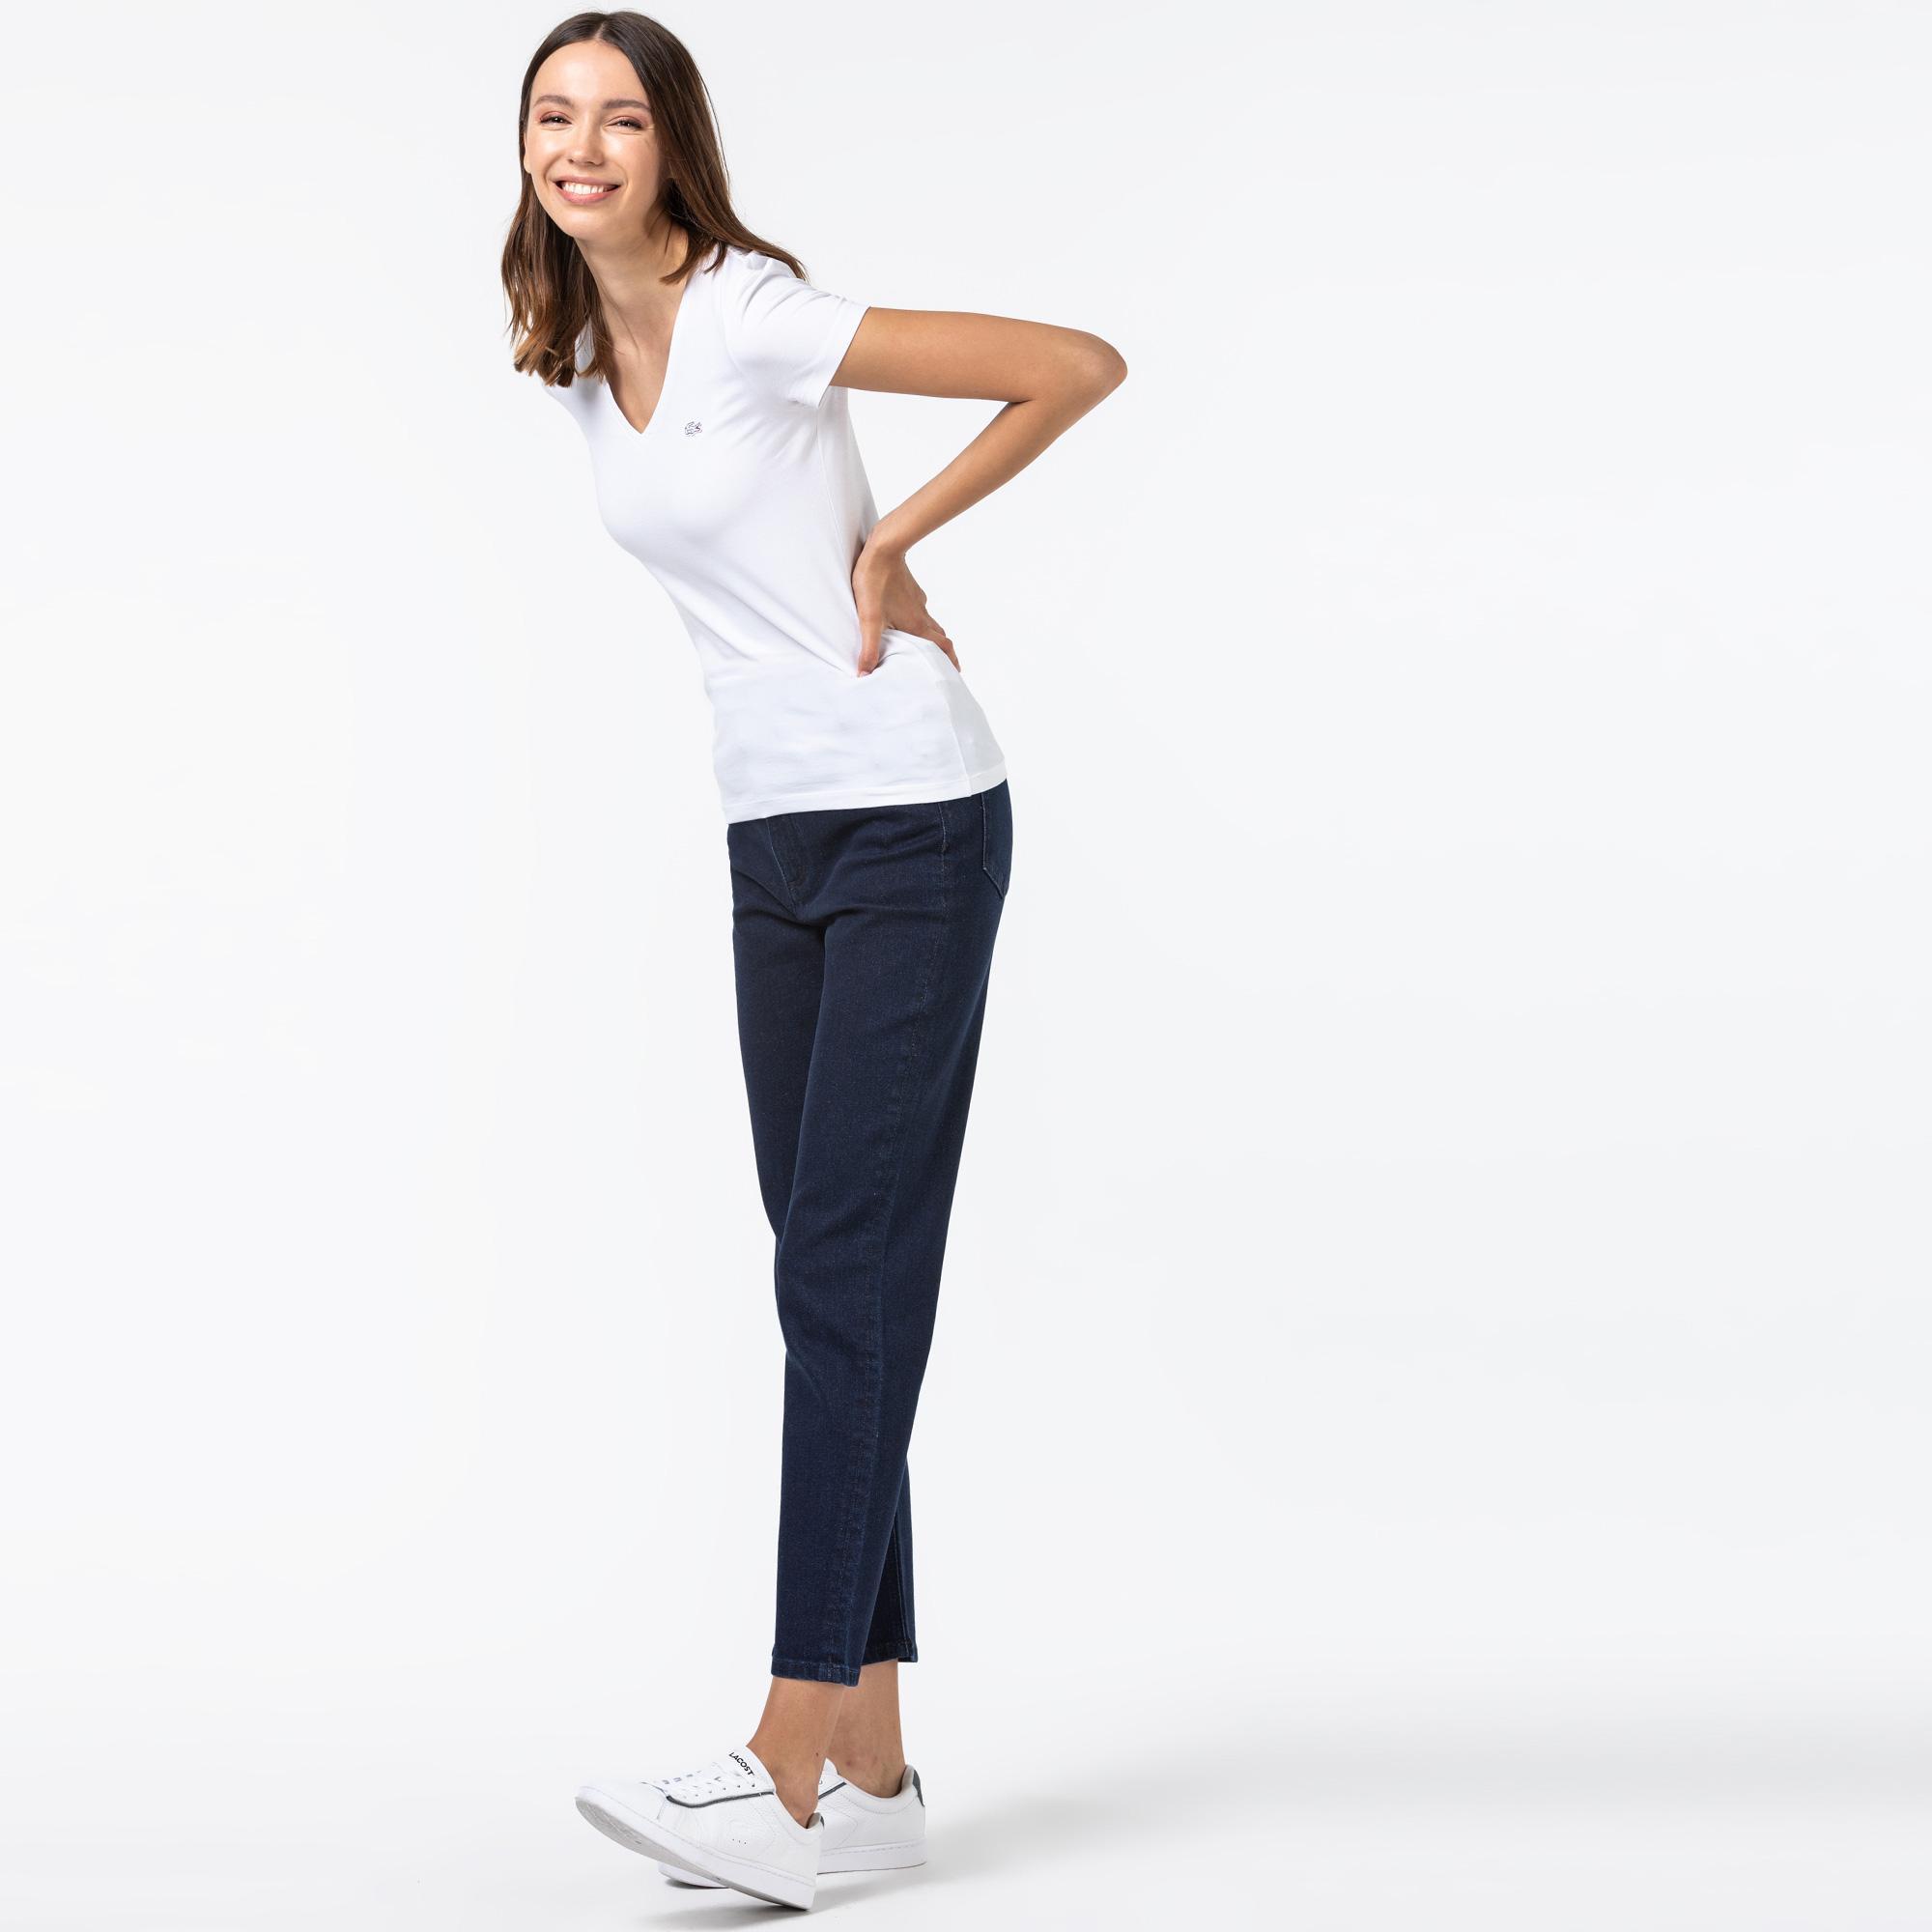 Lacoste Kadın Slim Fit Denim Lacivert Pantolon